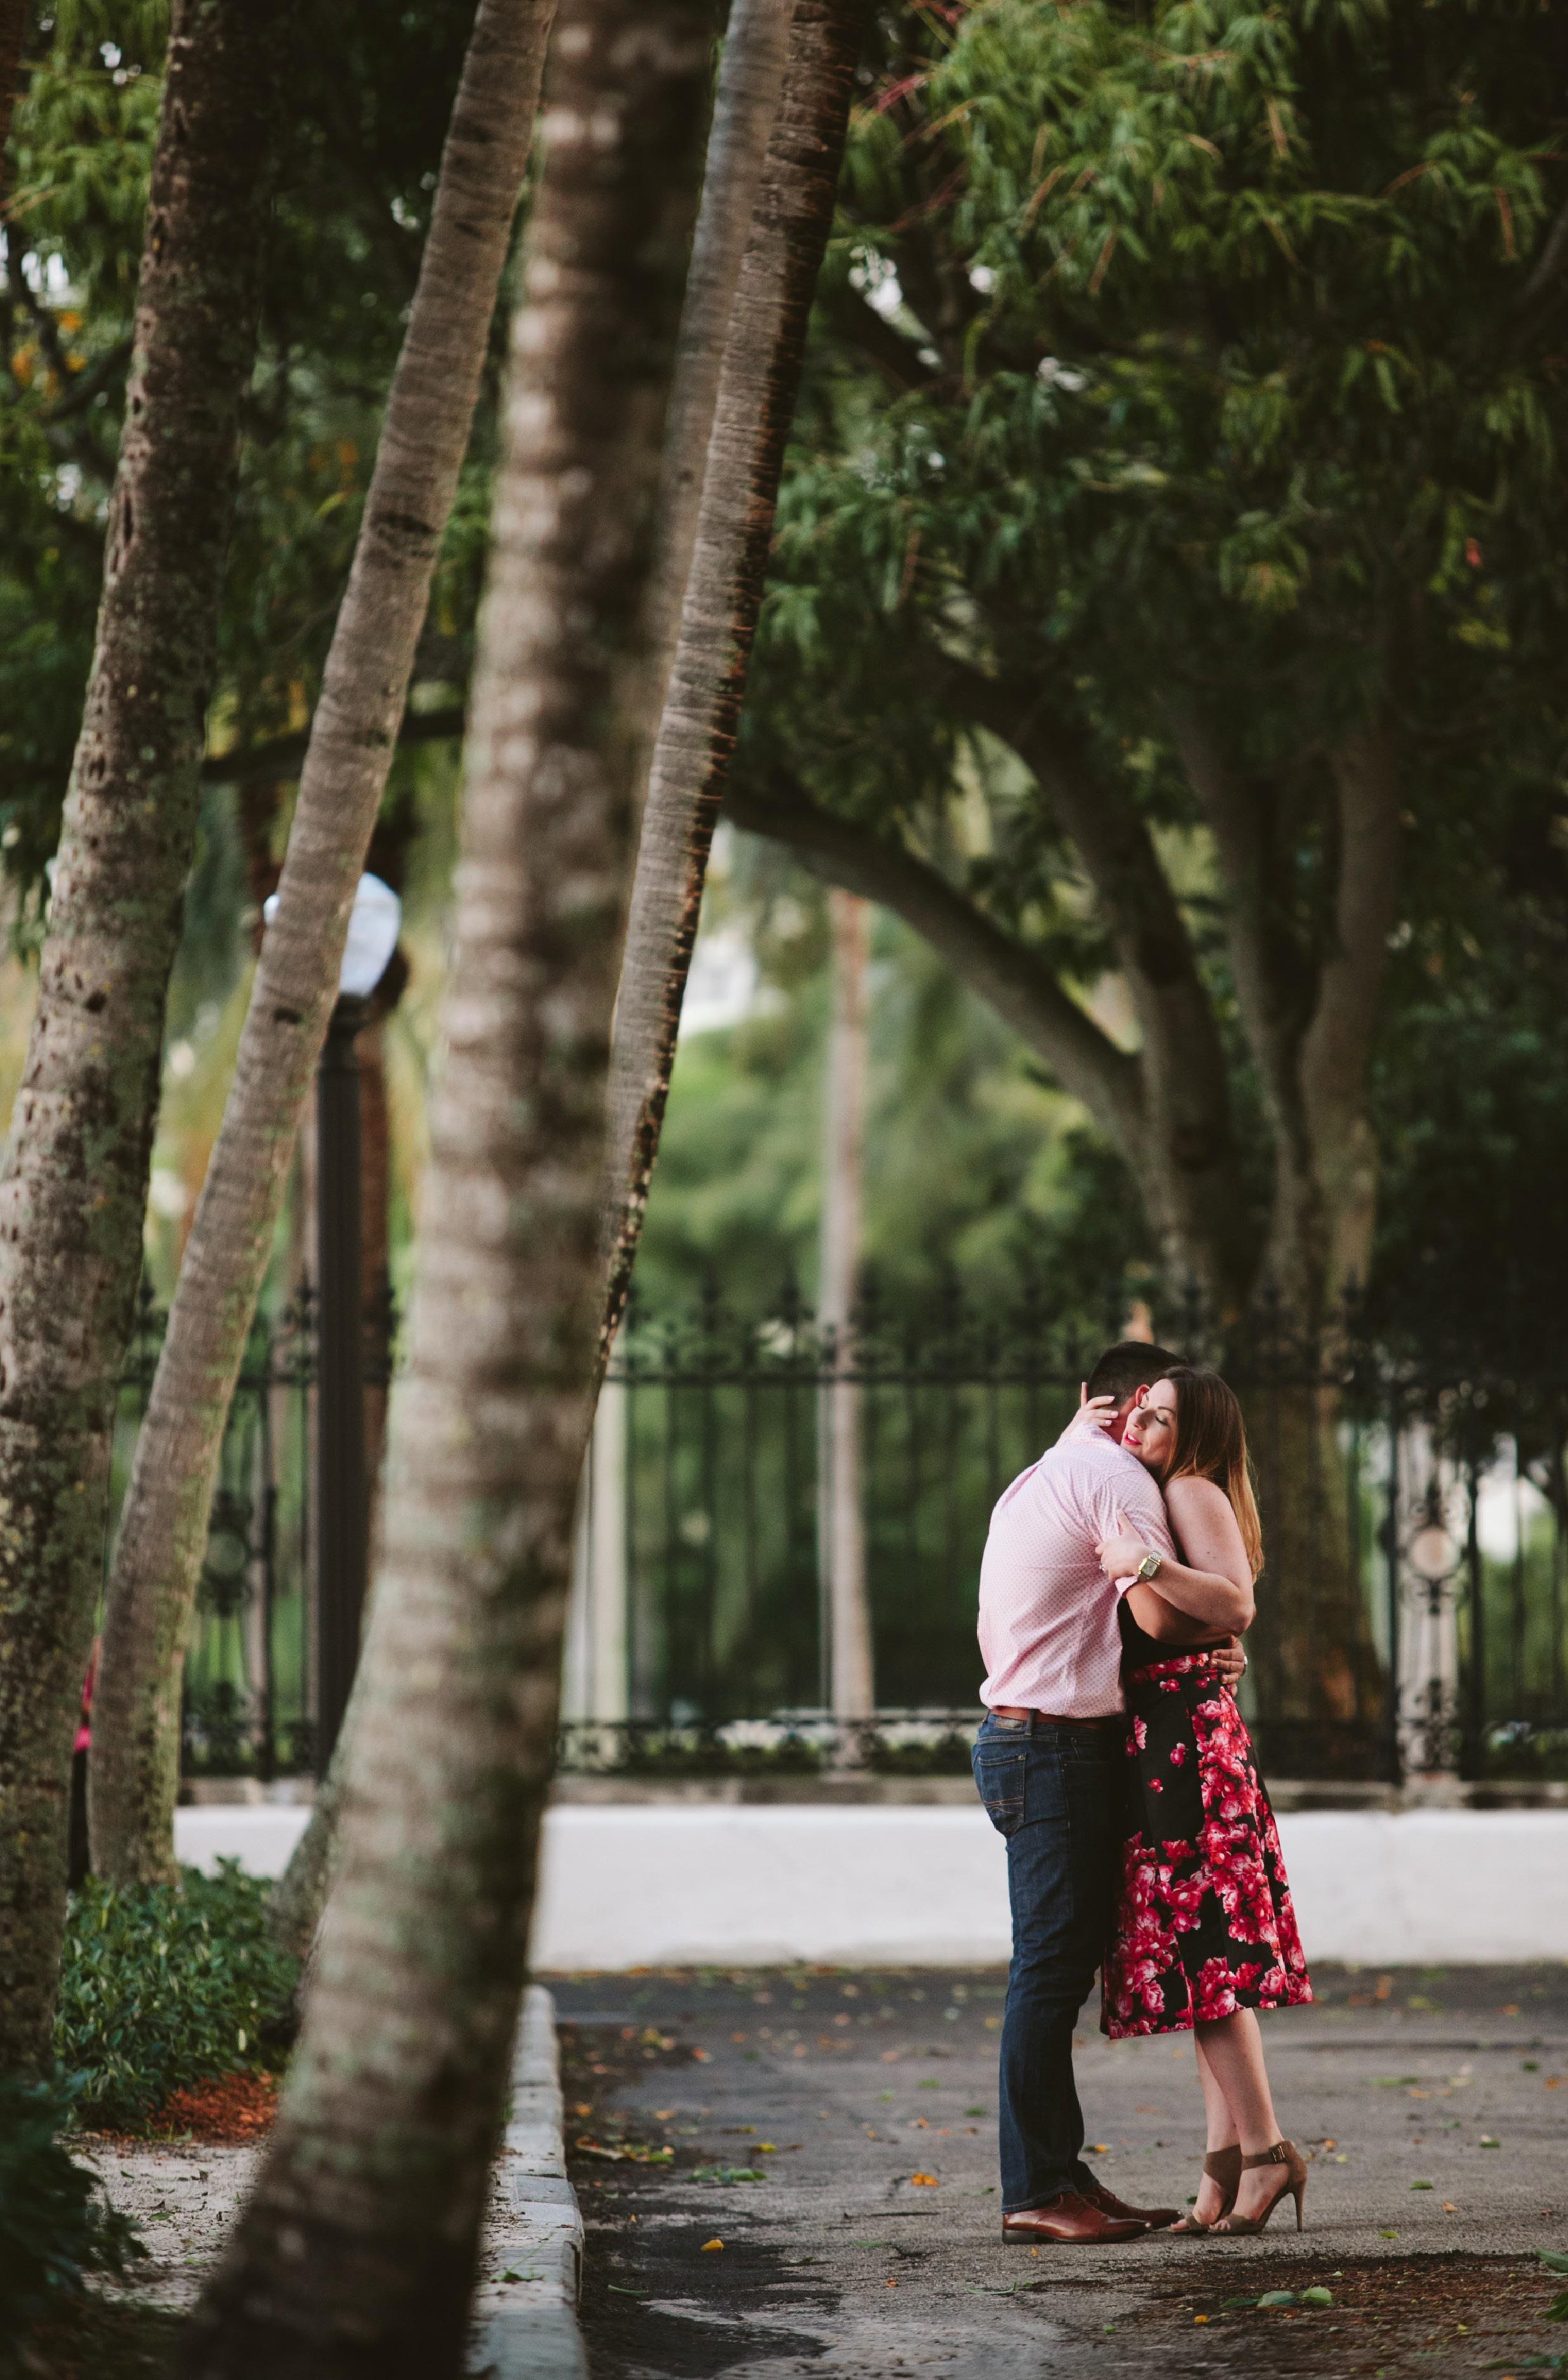 Ida + Danny Surprise Proposal Engagement Shoot at Flagler Museum Palm Beach3.jpg